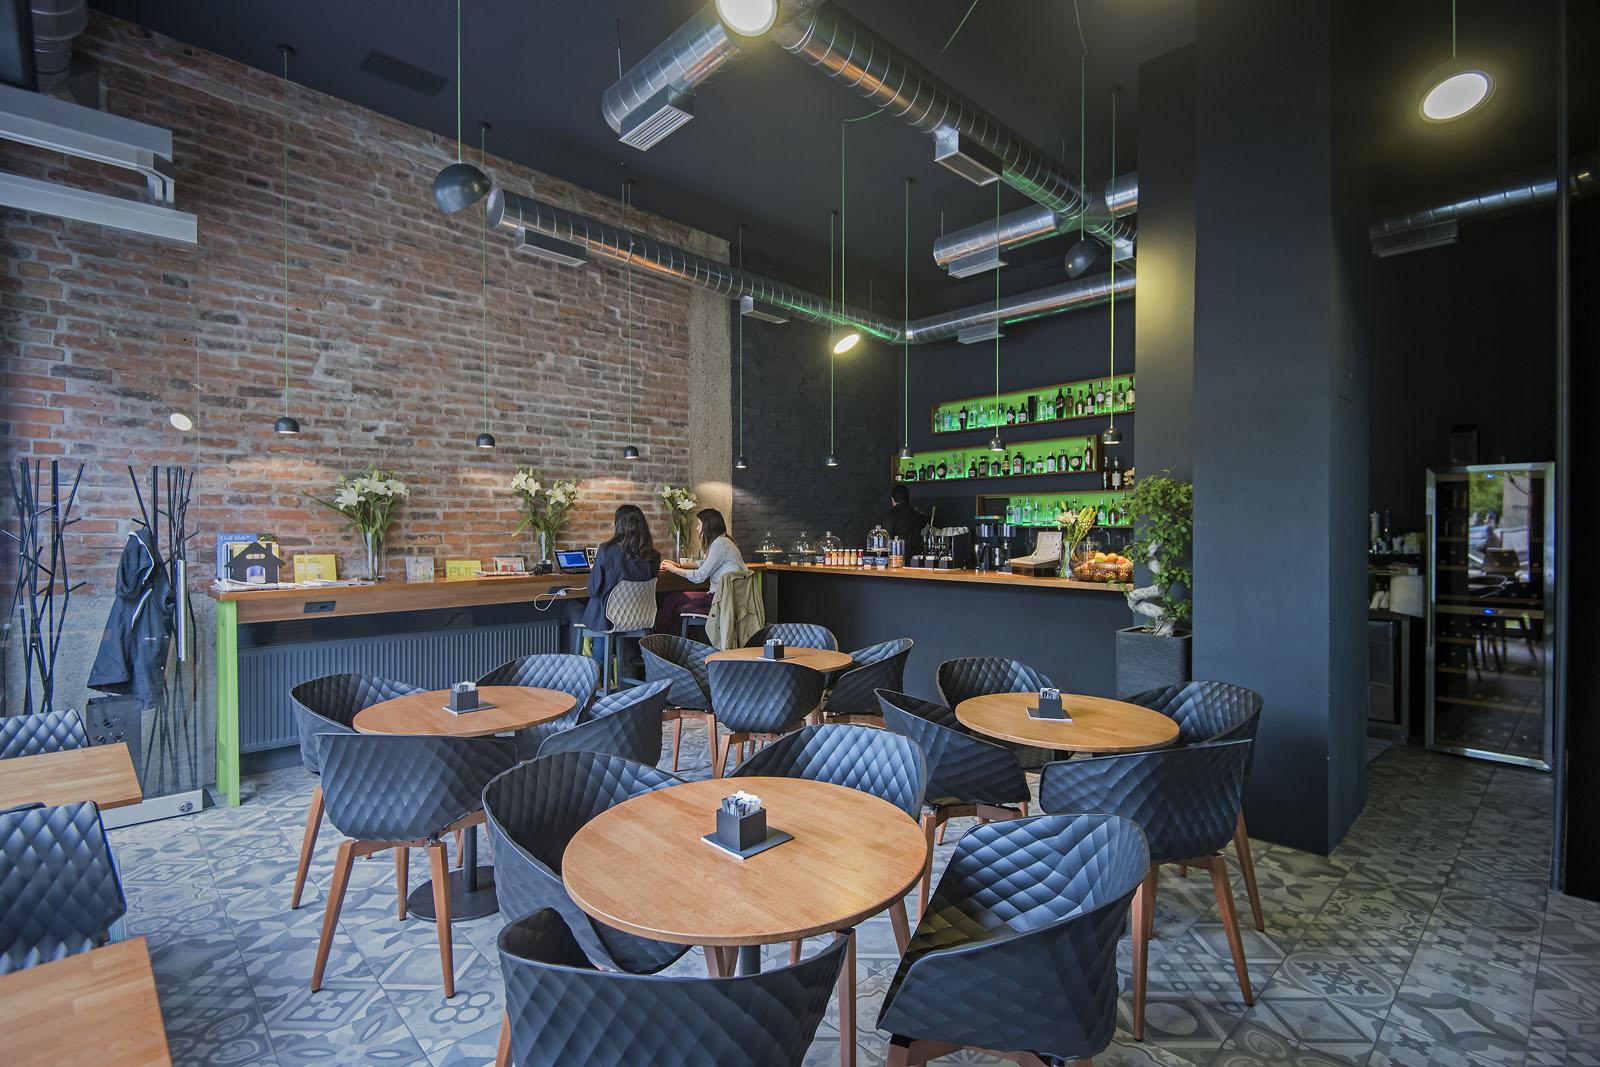 Zagreb, 140416. Marticeva 63. Novootvoreni lokal Verde Brunch and cafe. Foto: Neja Markicevic / CROPIX